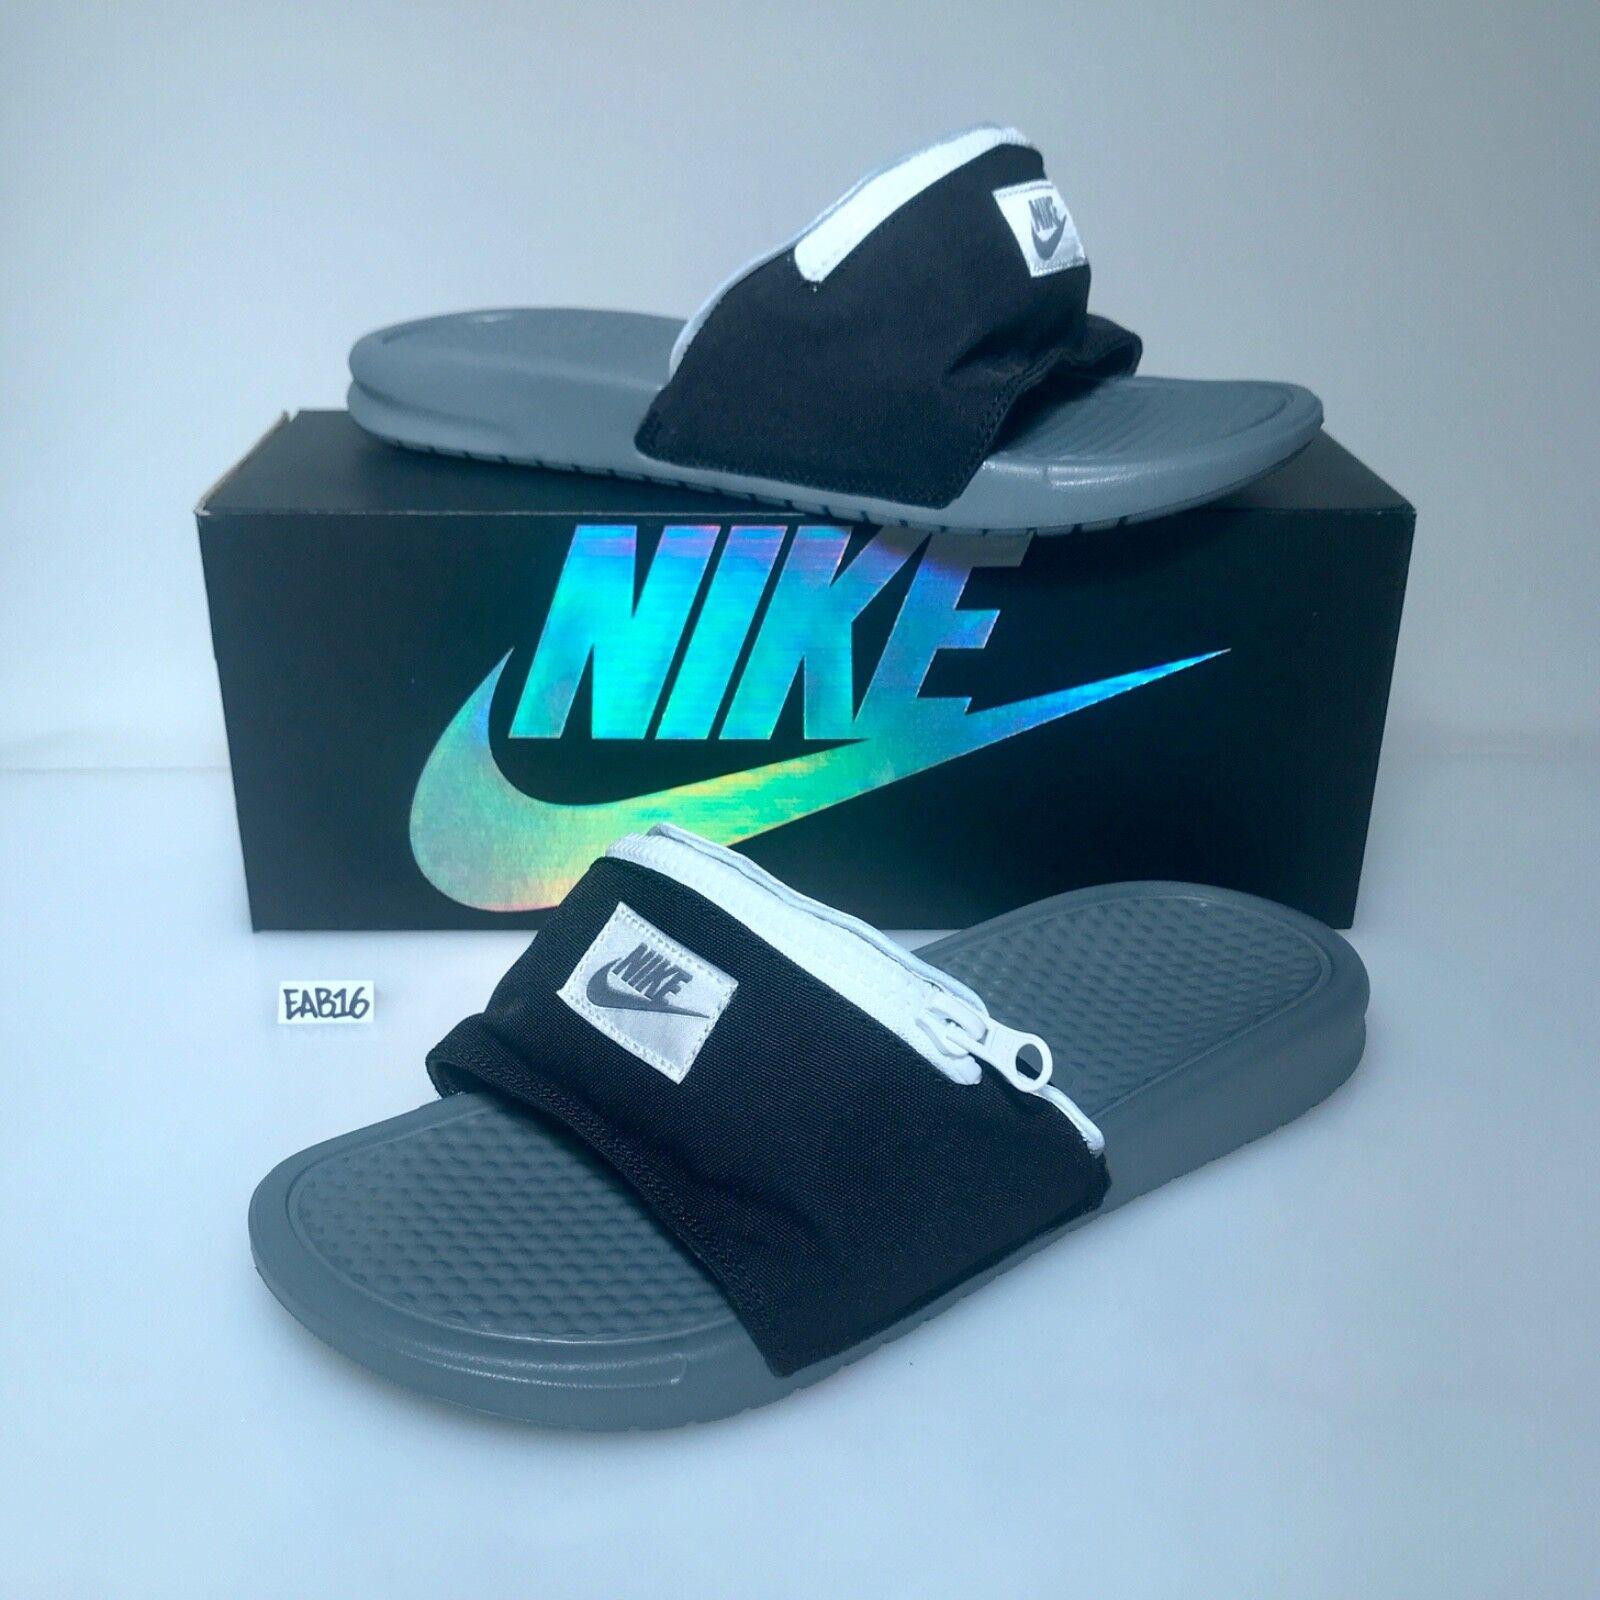 Nike benassi grigio jdi marsupio slide nero grigio benassi bianco grigio - vertice ao1037 001 7606dc